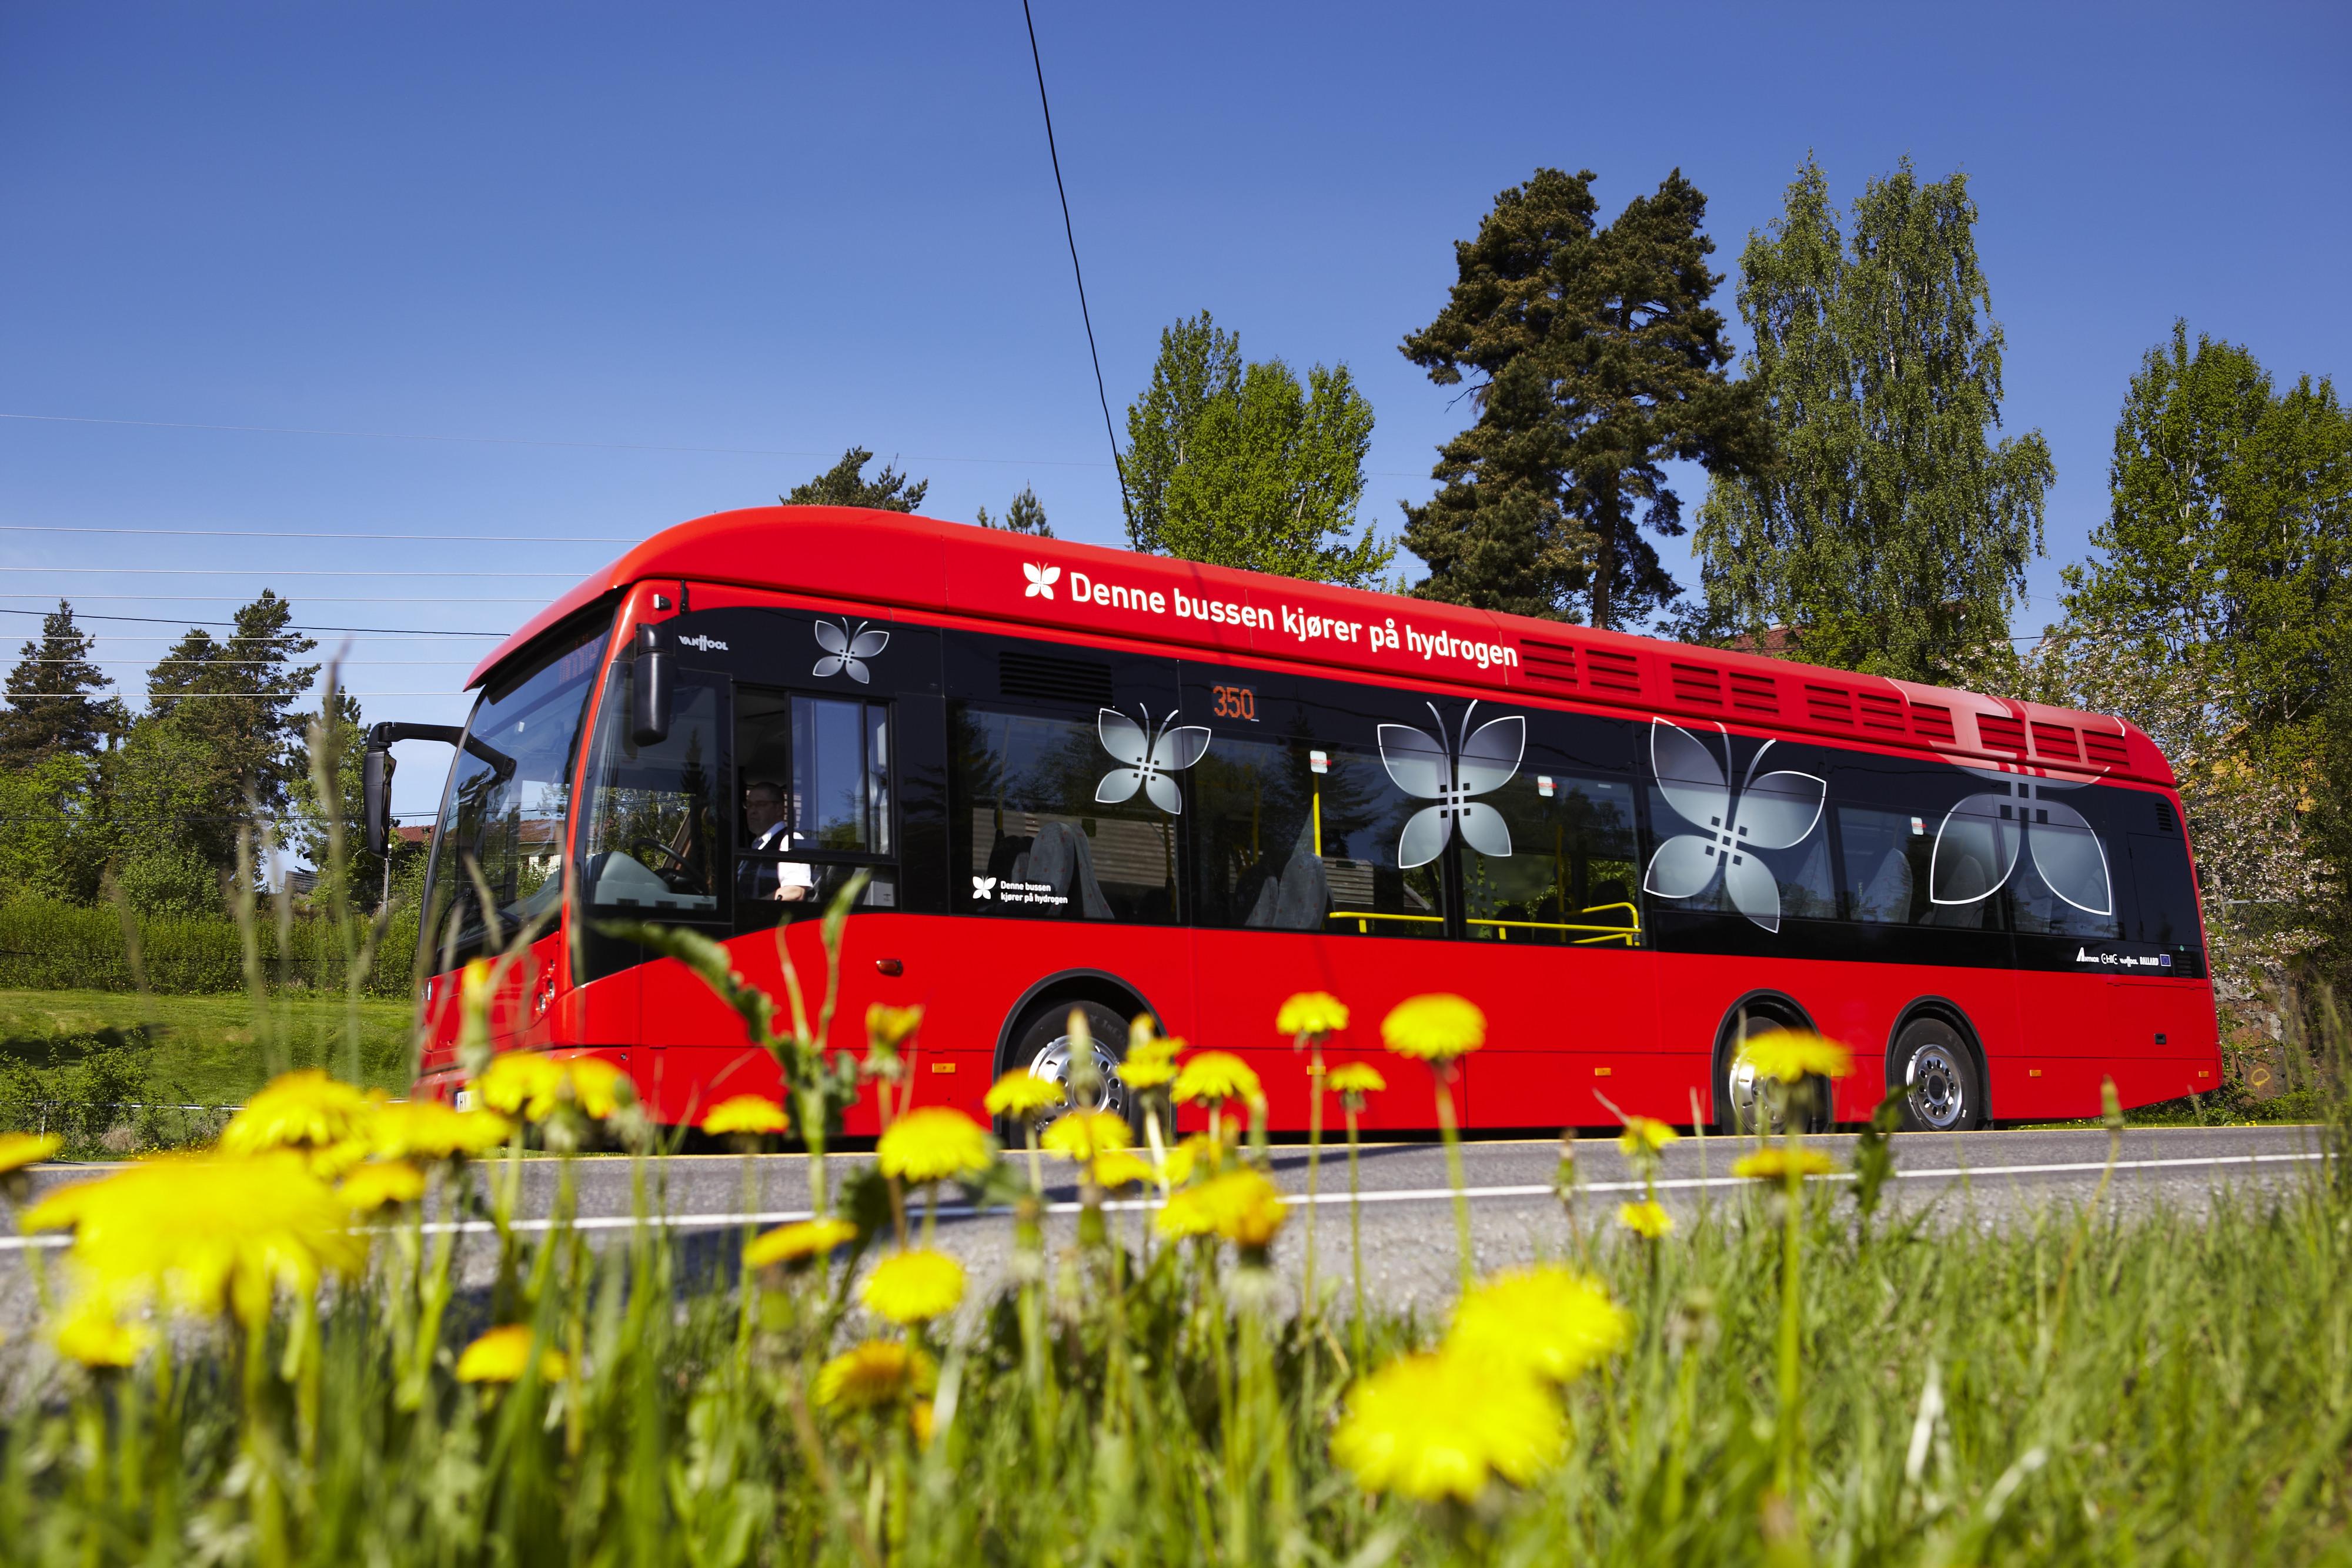 EU fuel cell bus project reaches important milestone